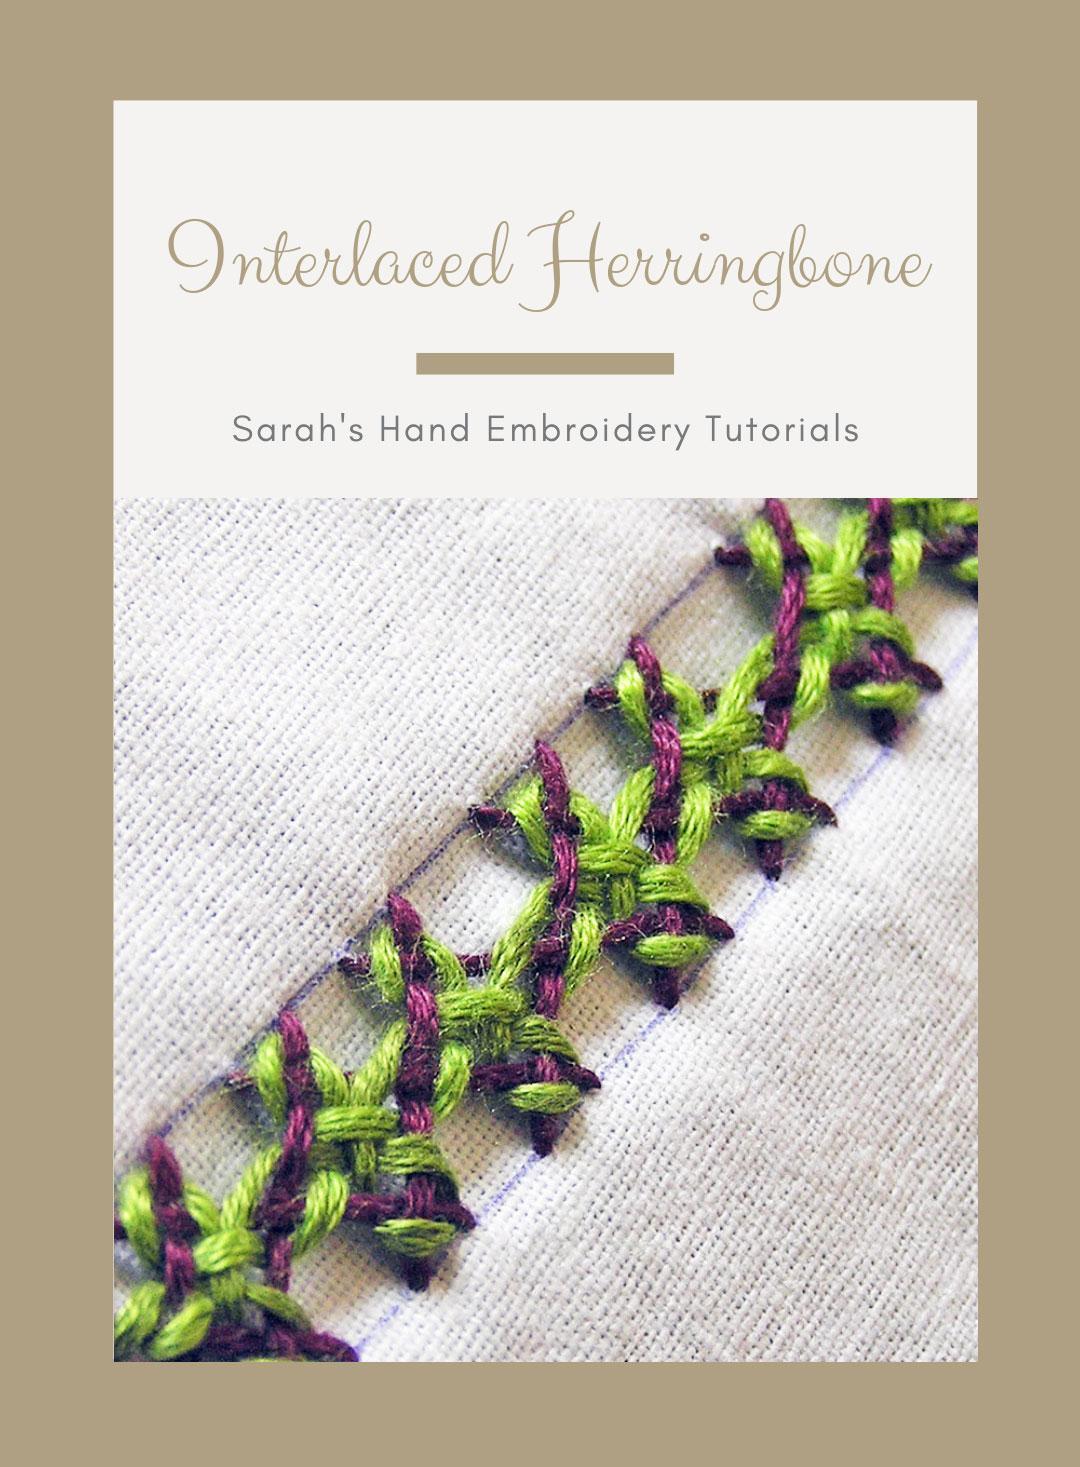 Interlaced Herringbone Stitch – Sarah's Hand Embroidery Tutorials